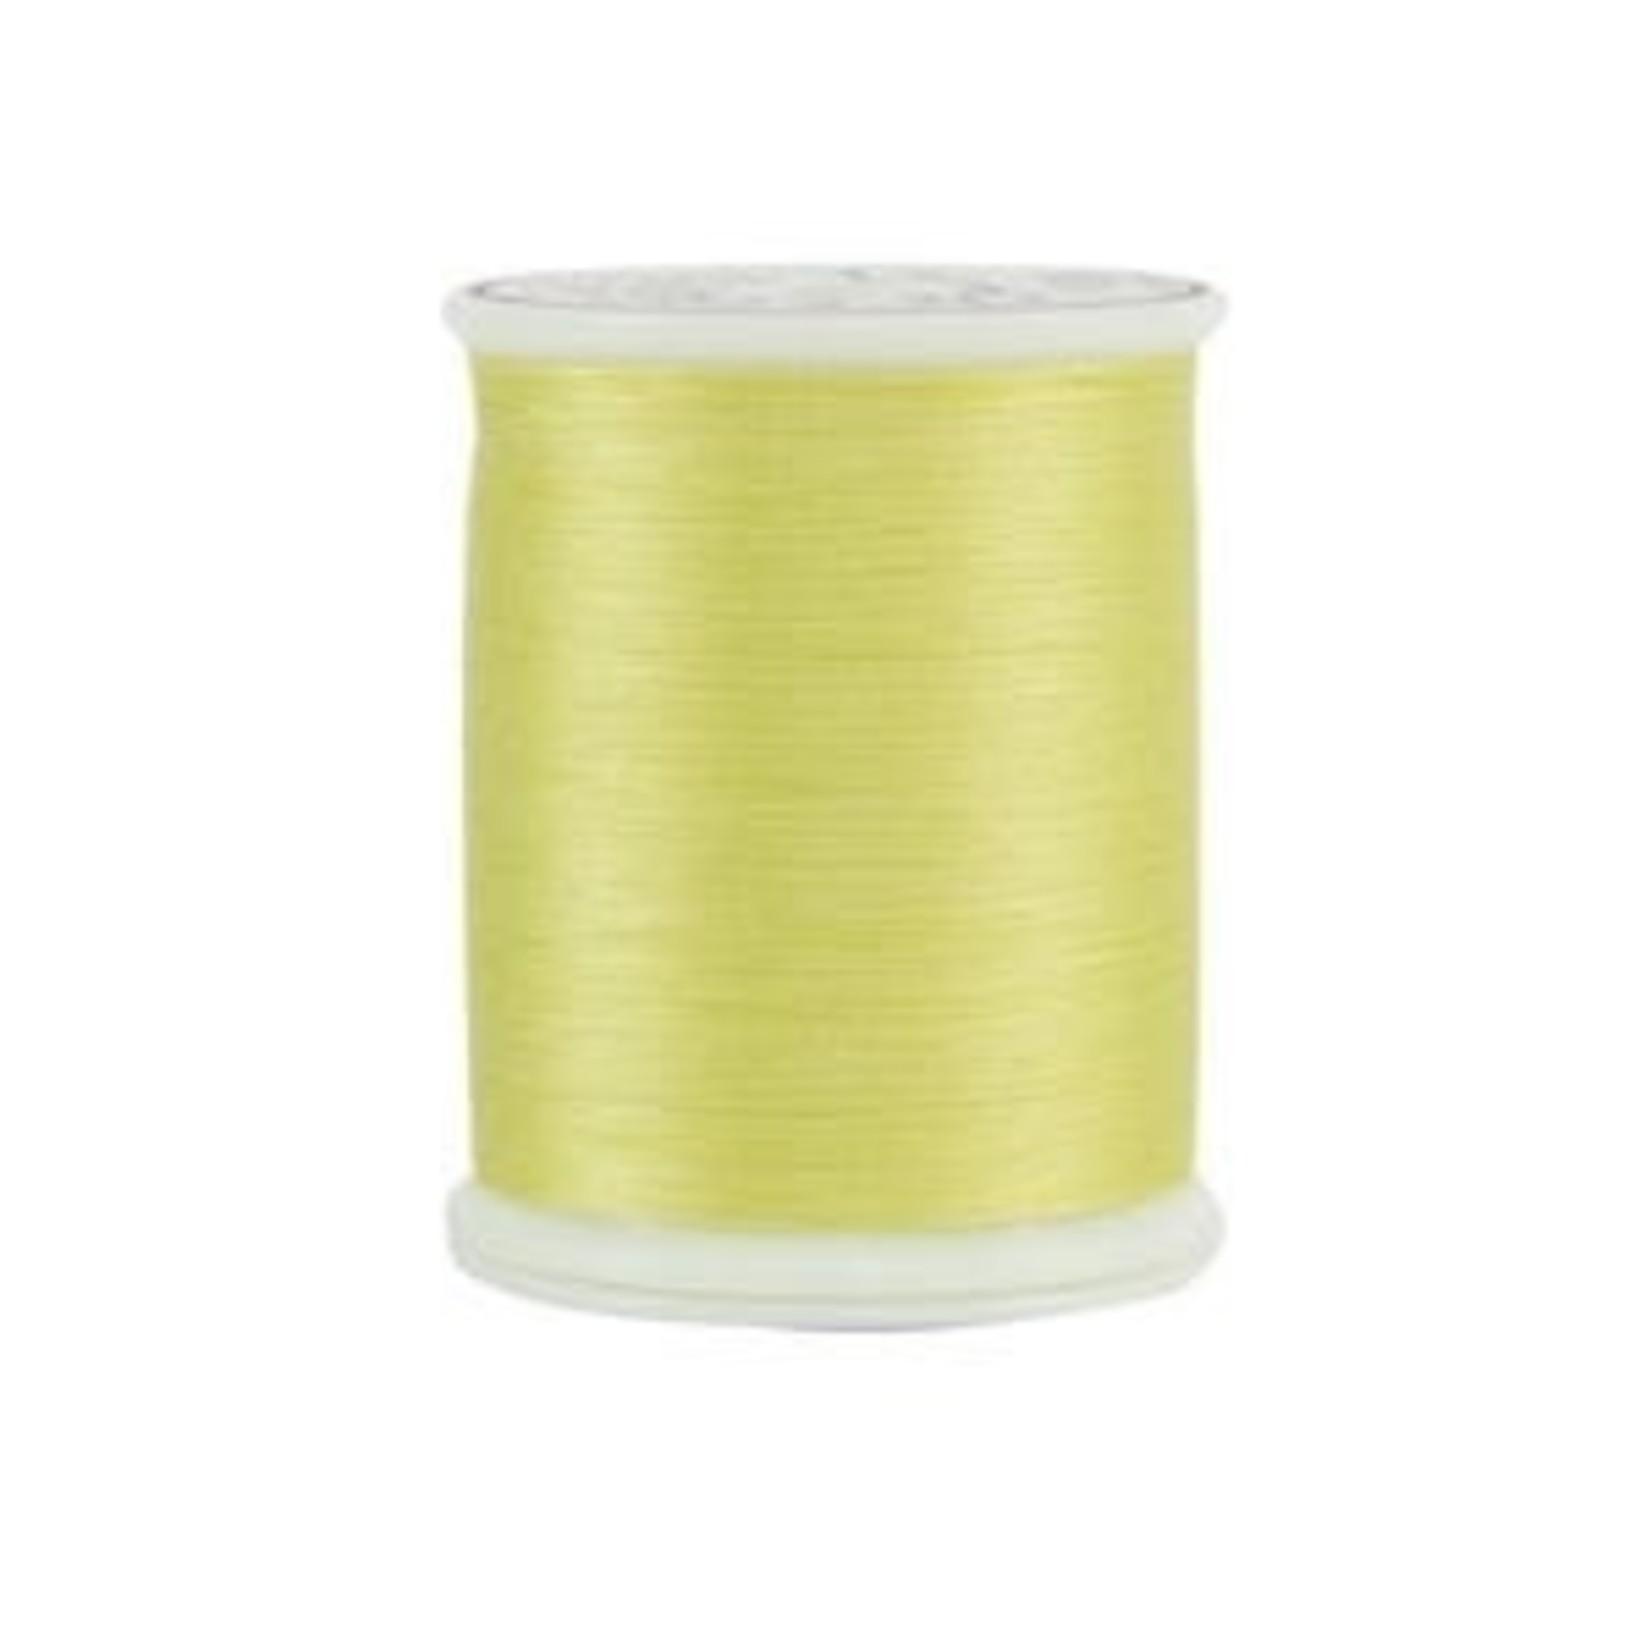 Superior Threads King Tut - #40 - 457 m - 1005 Lemon Grass